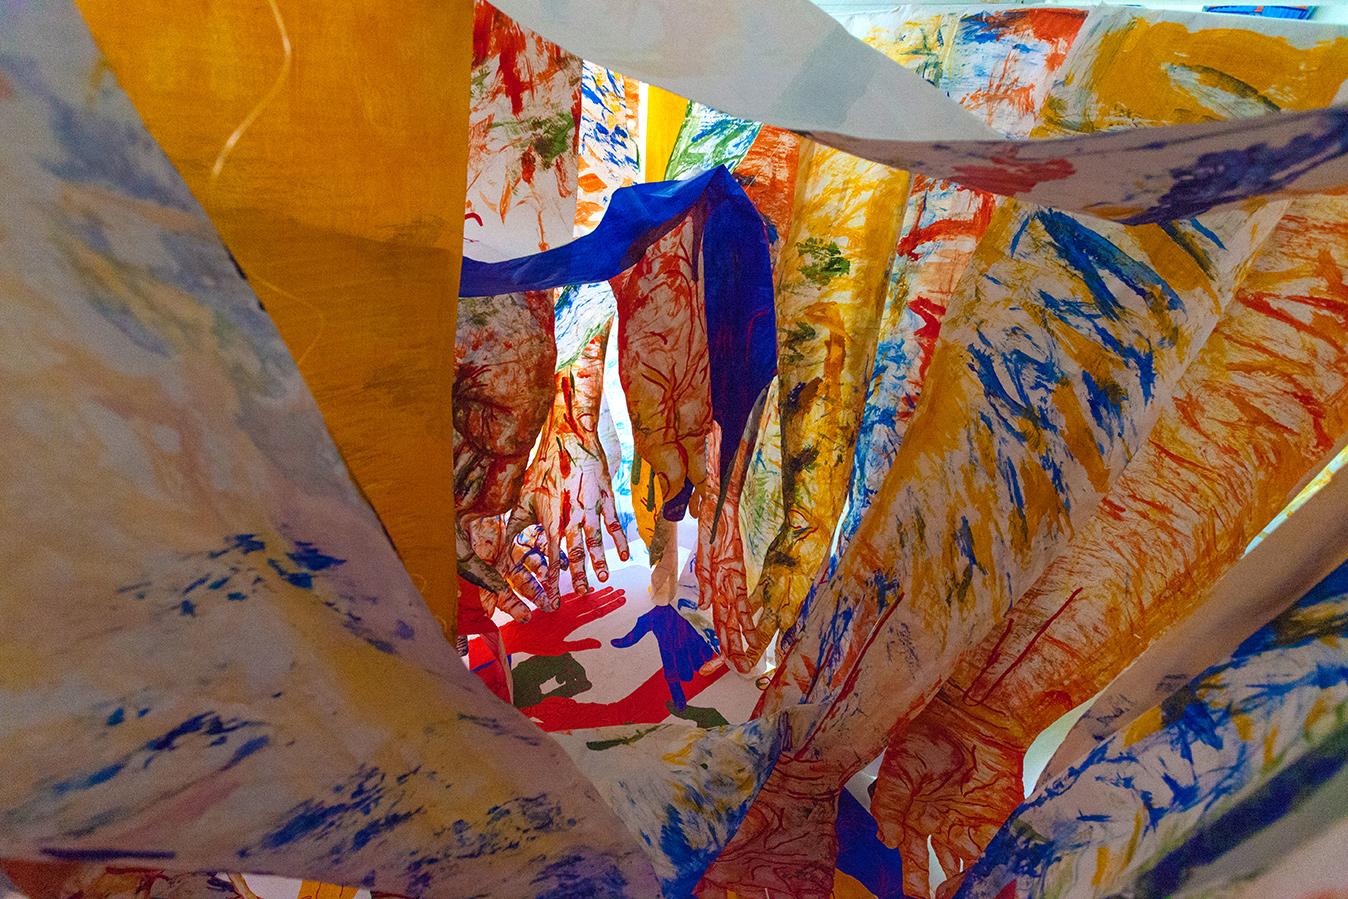 hands-tesseract-installation-hand-sails-mirena-rhee_01.jpg